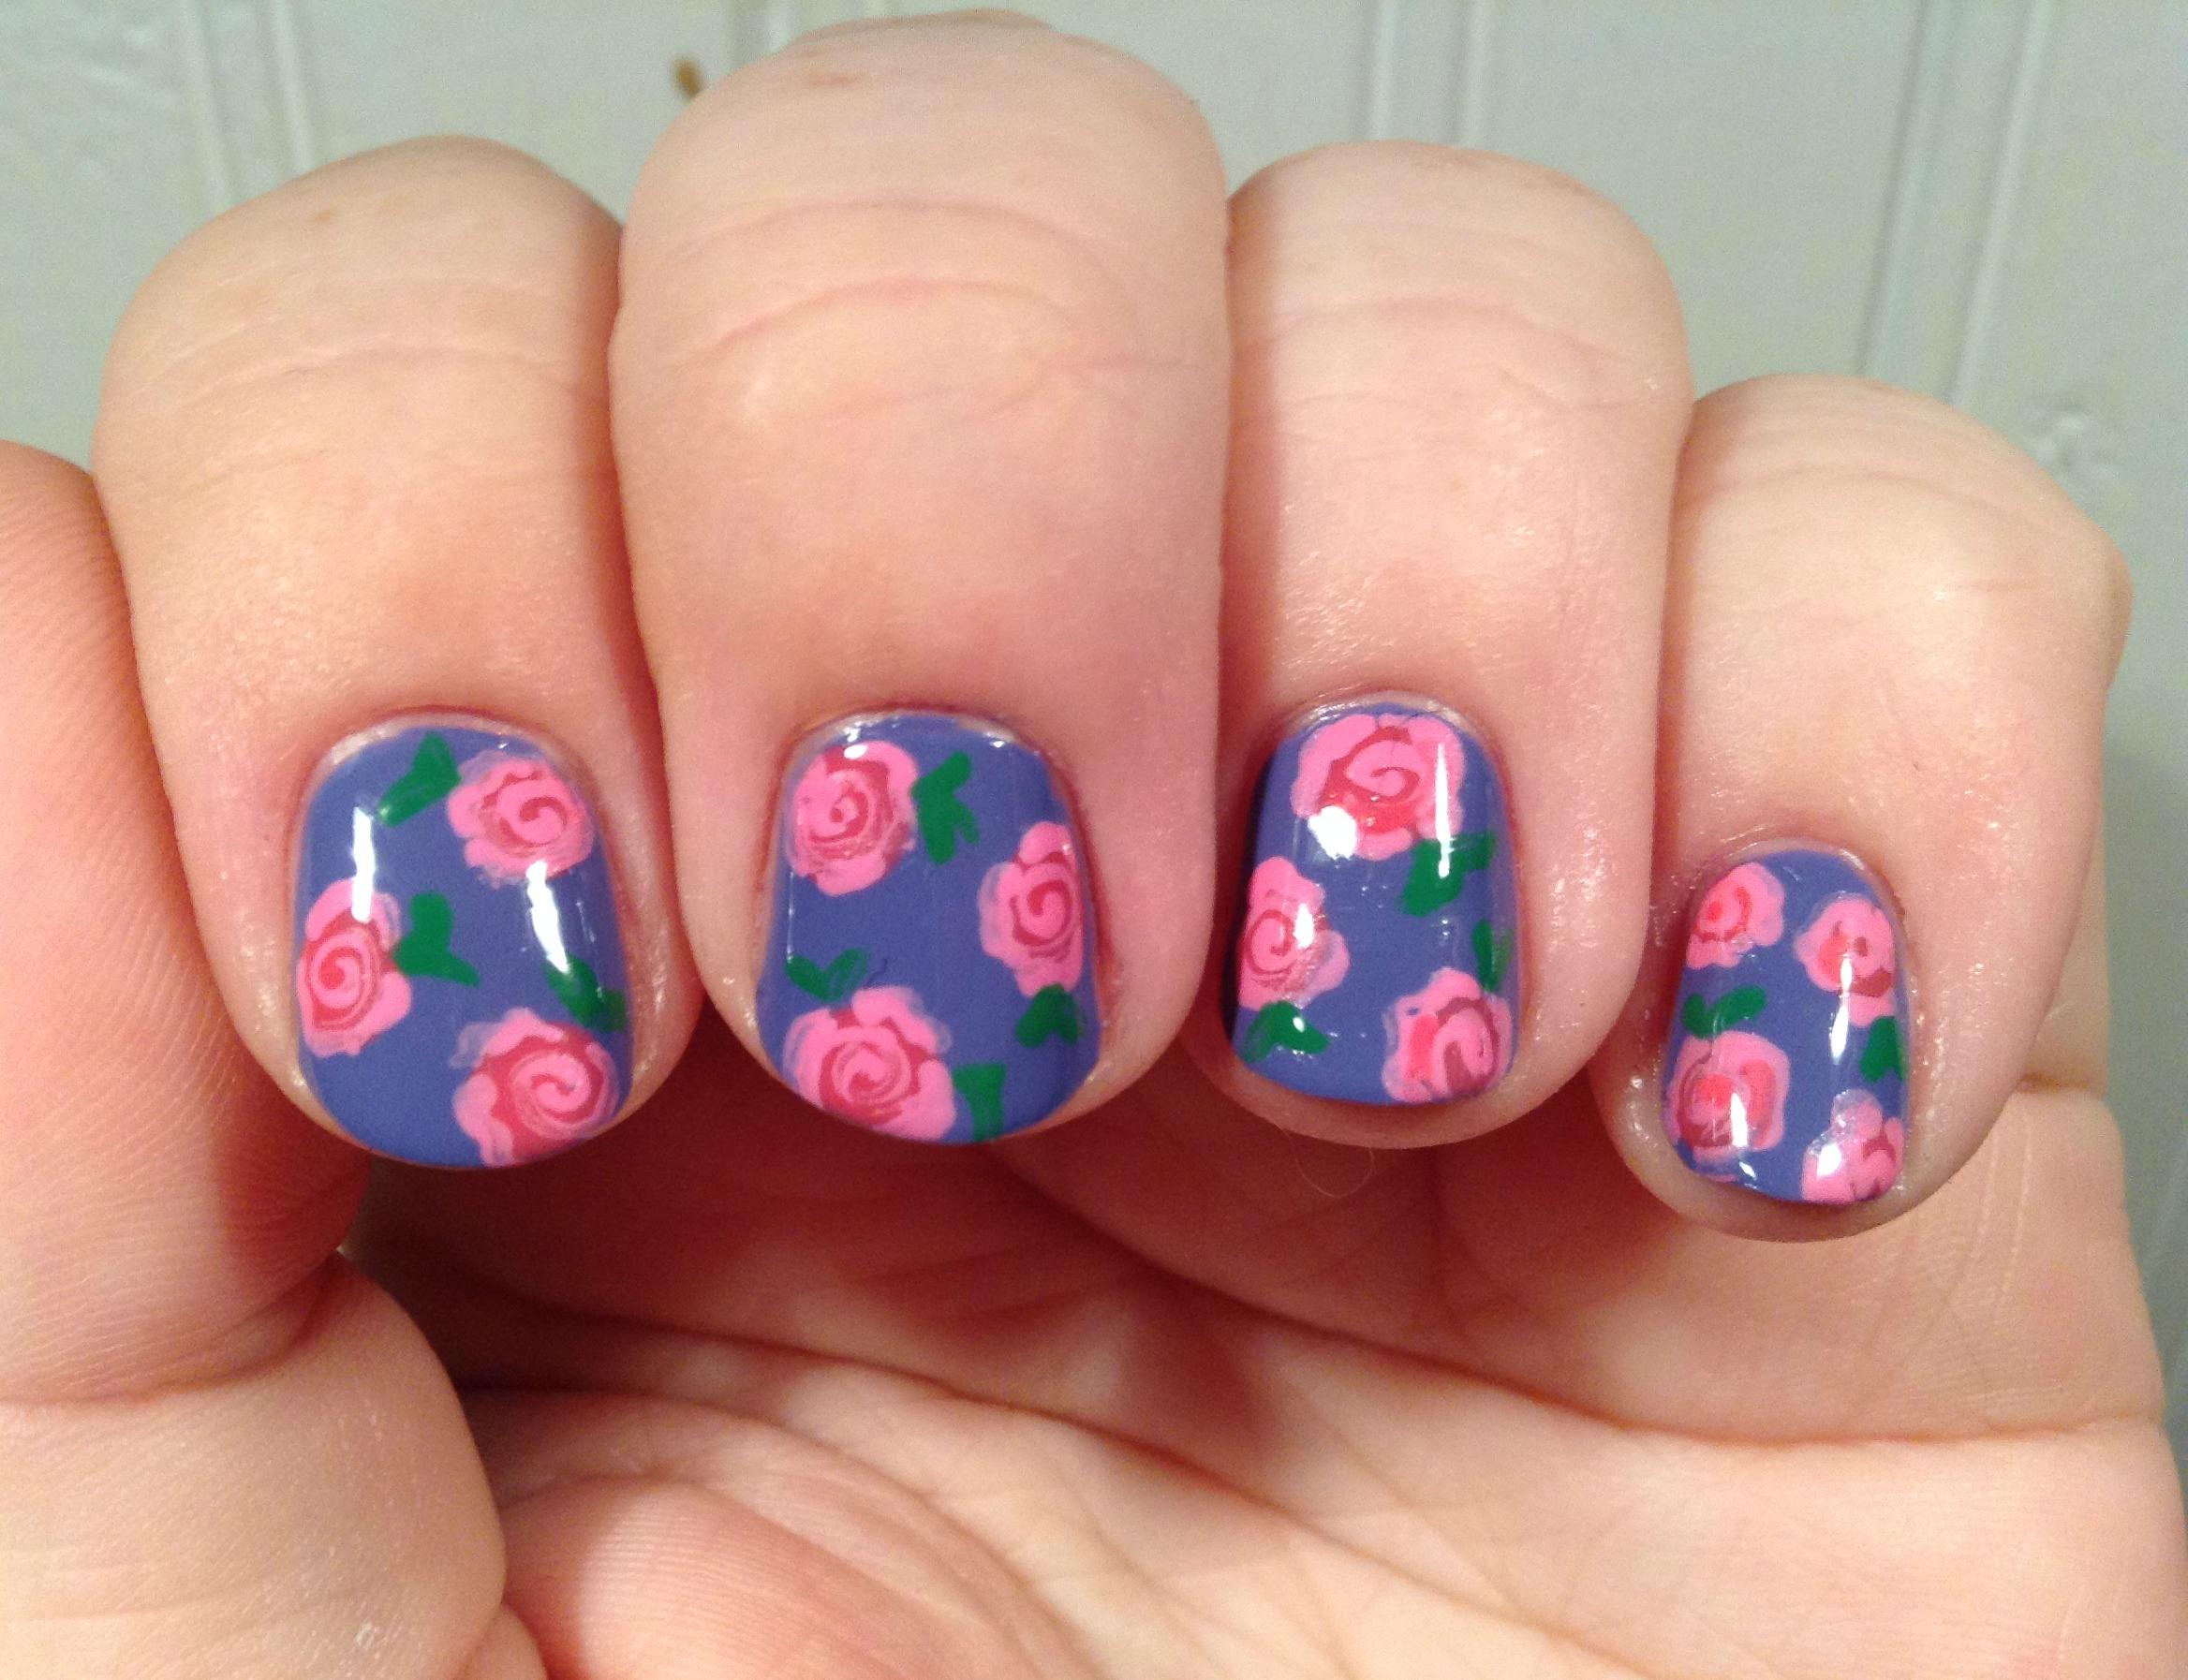 Rose Fingers